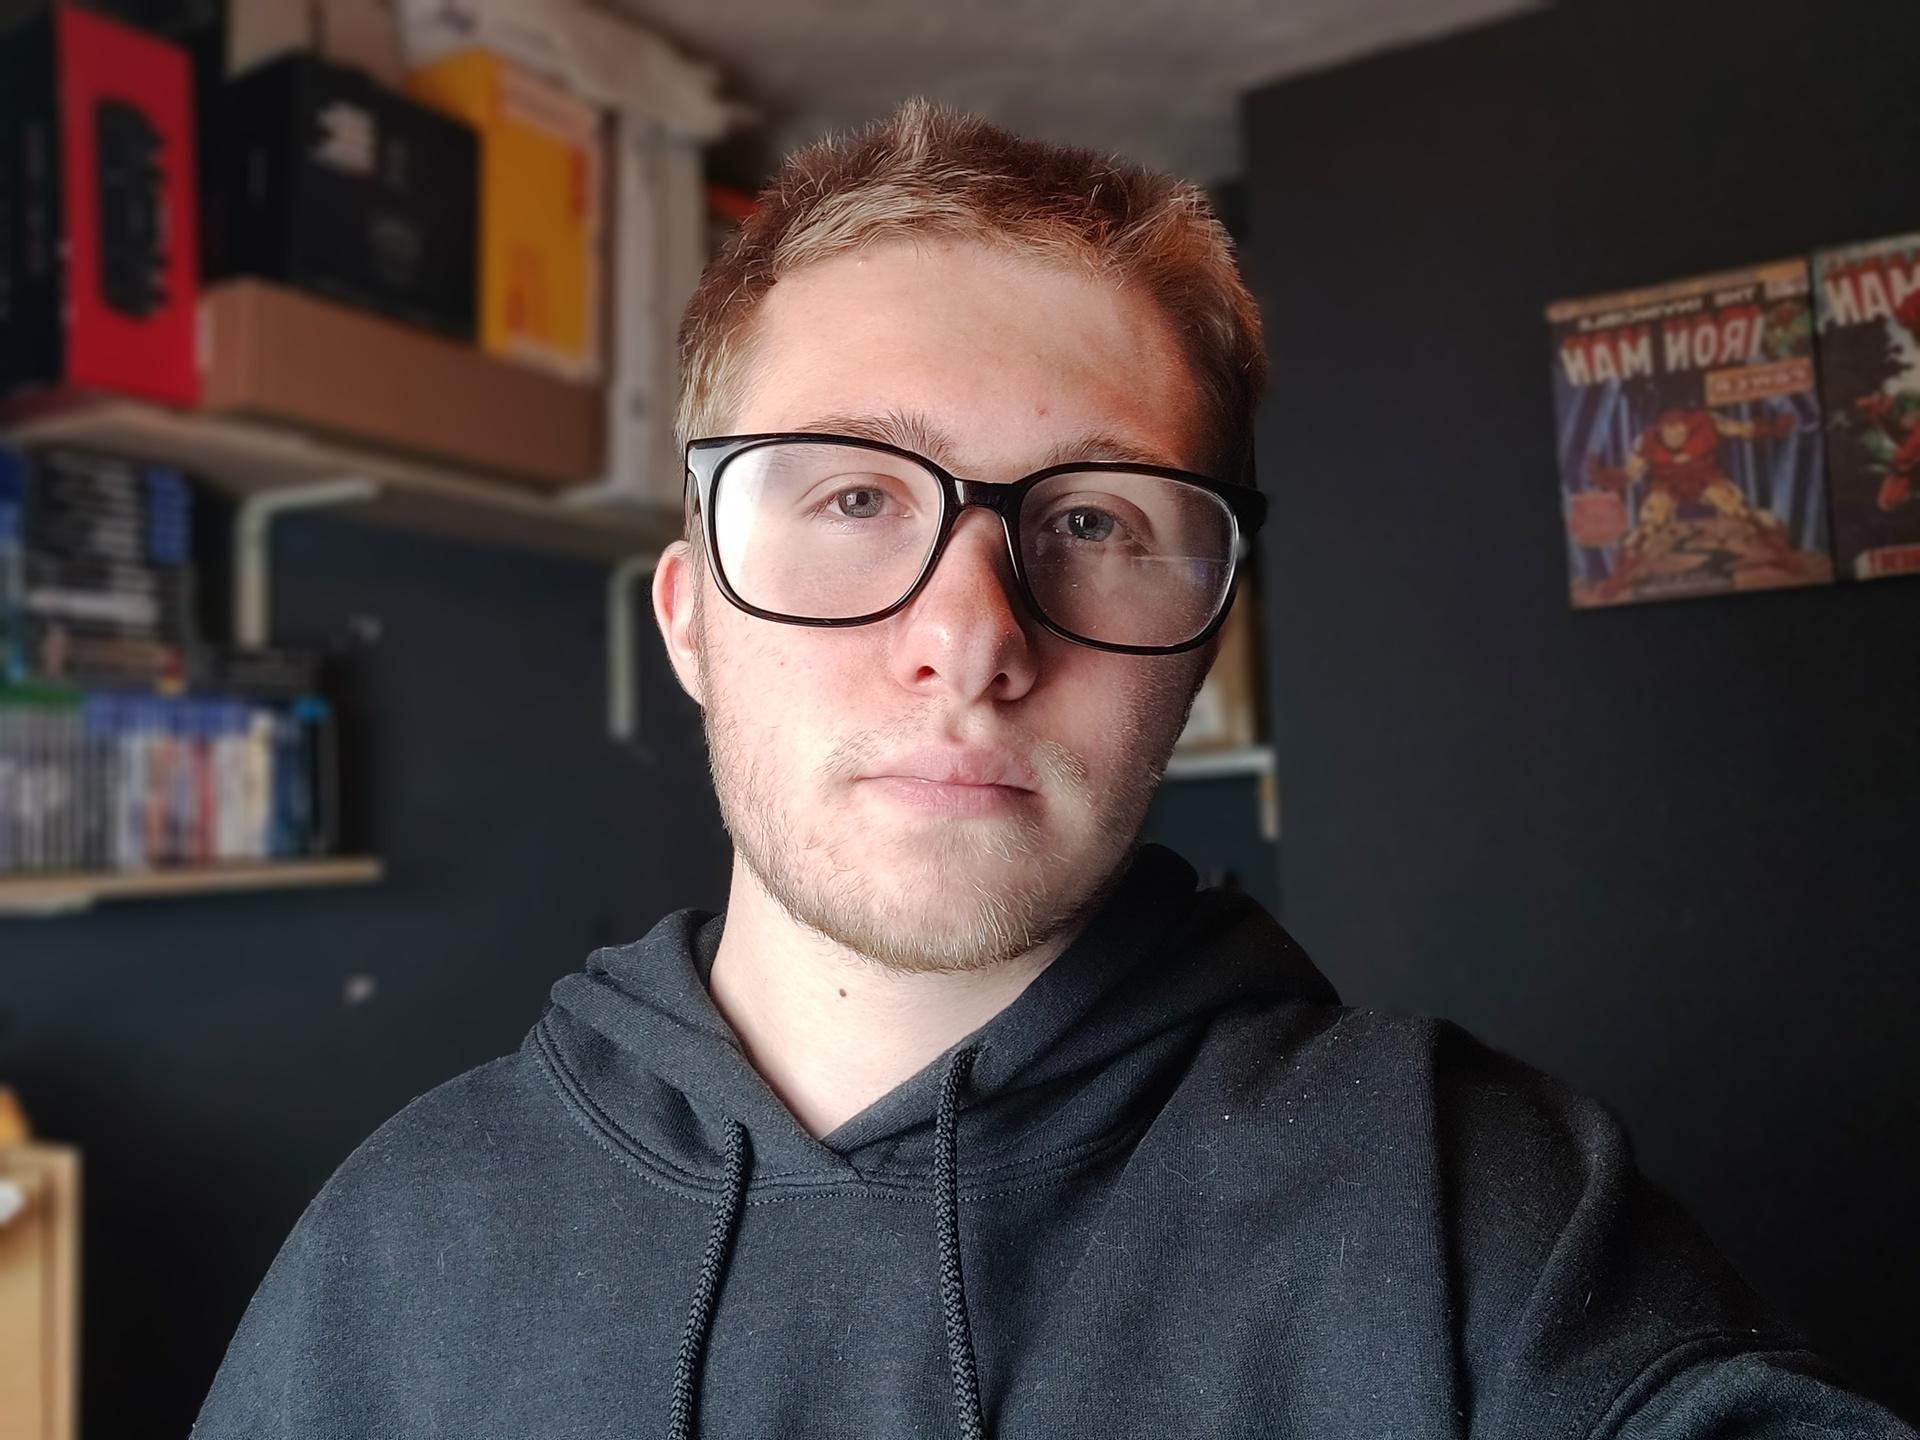 OnePlus 8T dimly lit indoor selfie portrait camera sample